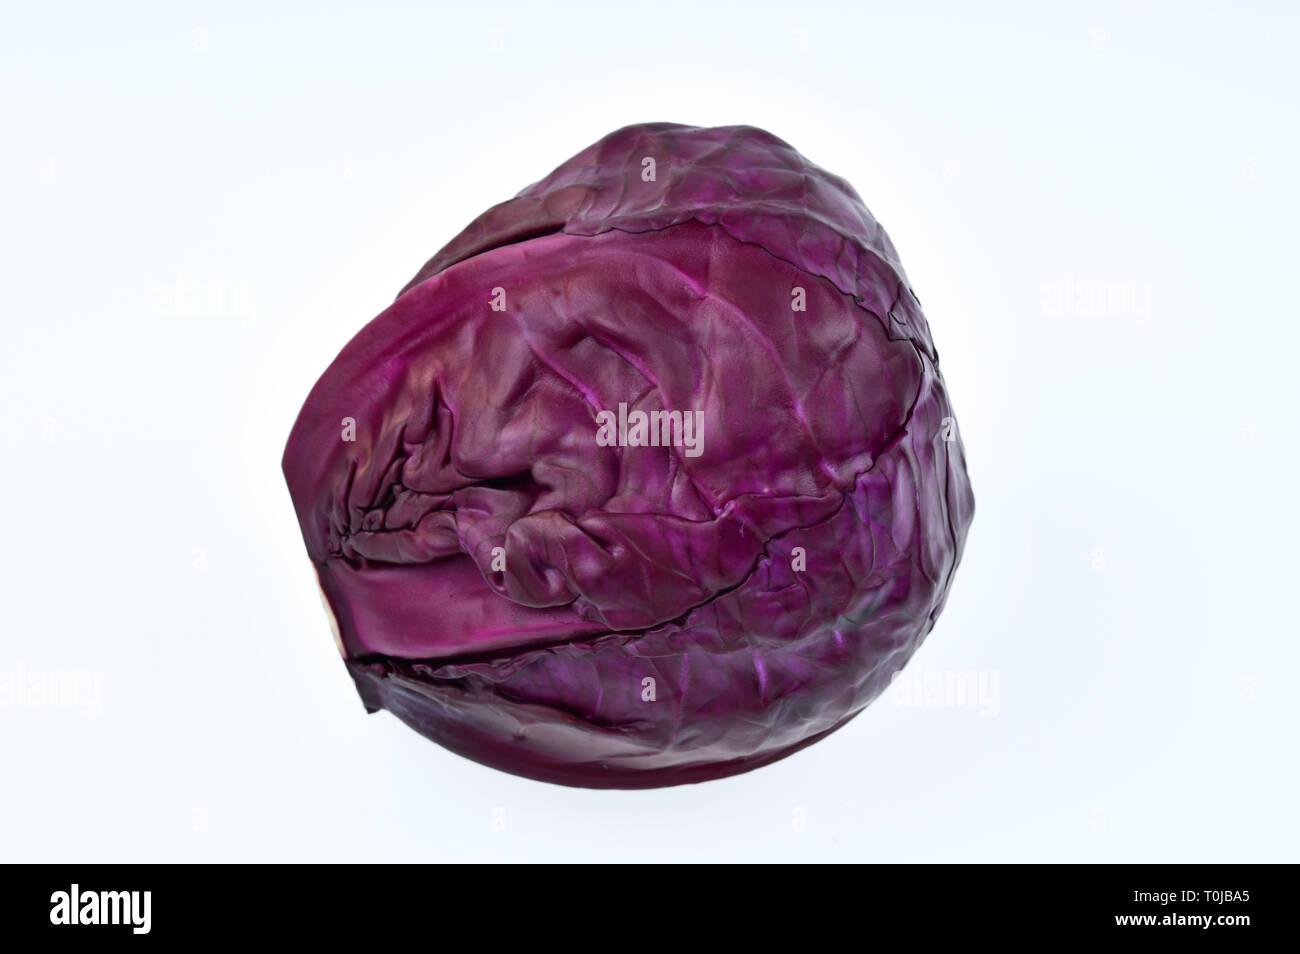 Red cabbage, studio admission, Rotkohl, Studioaufnahme - Stock Image